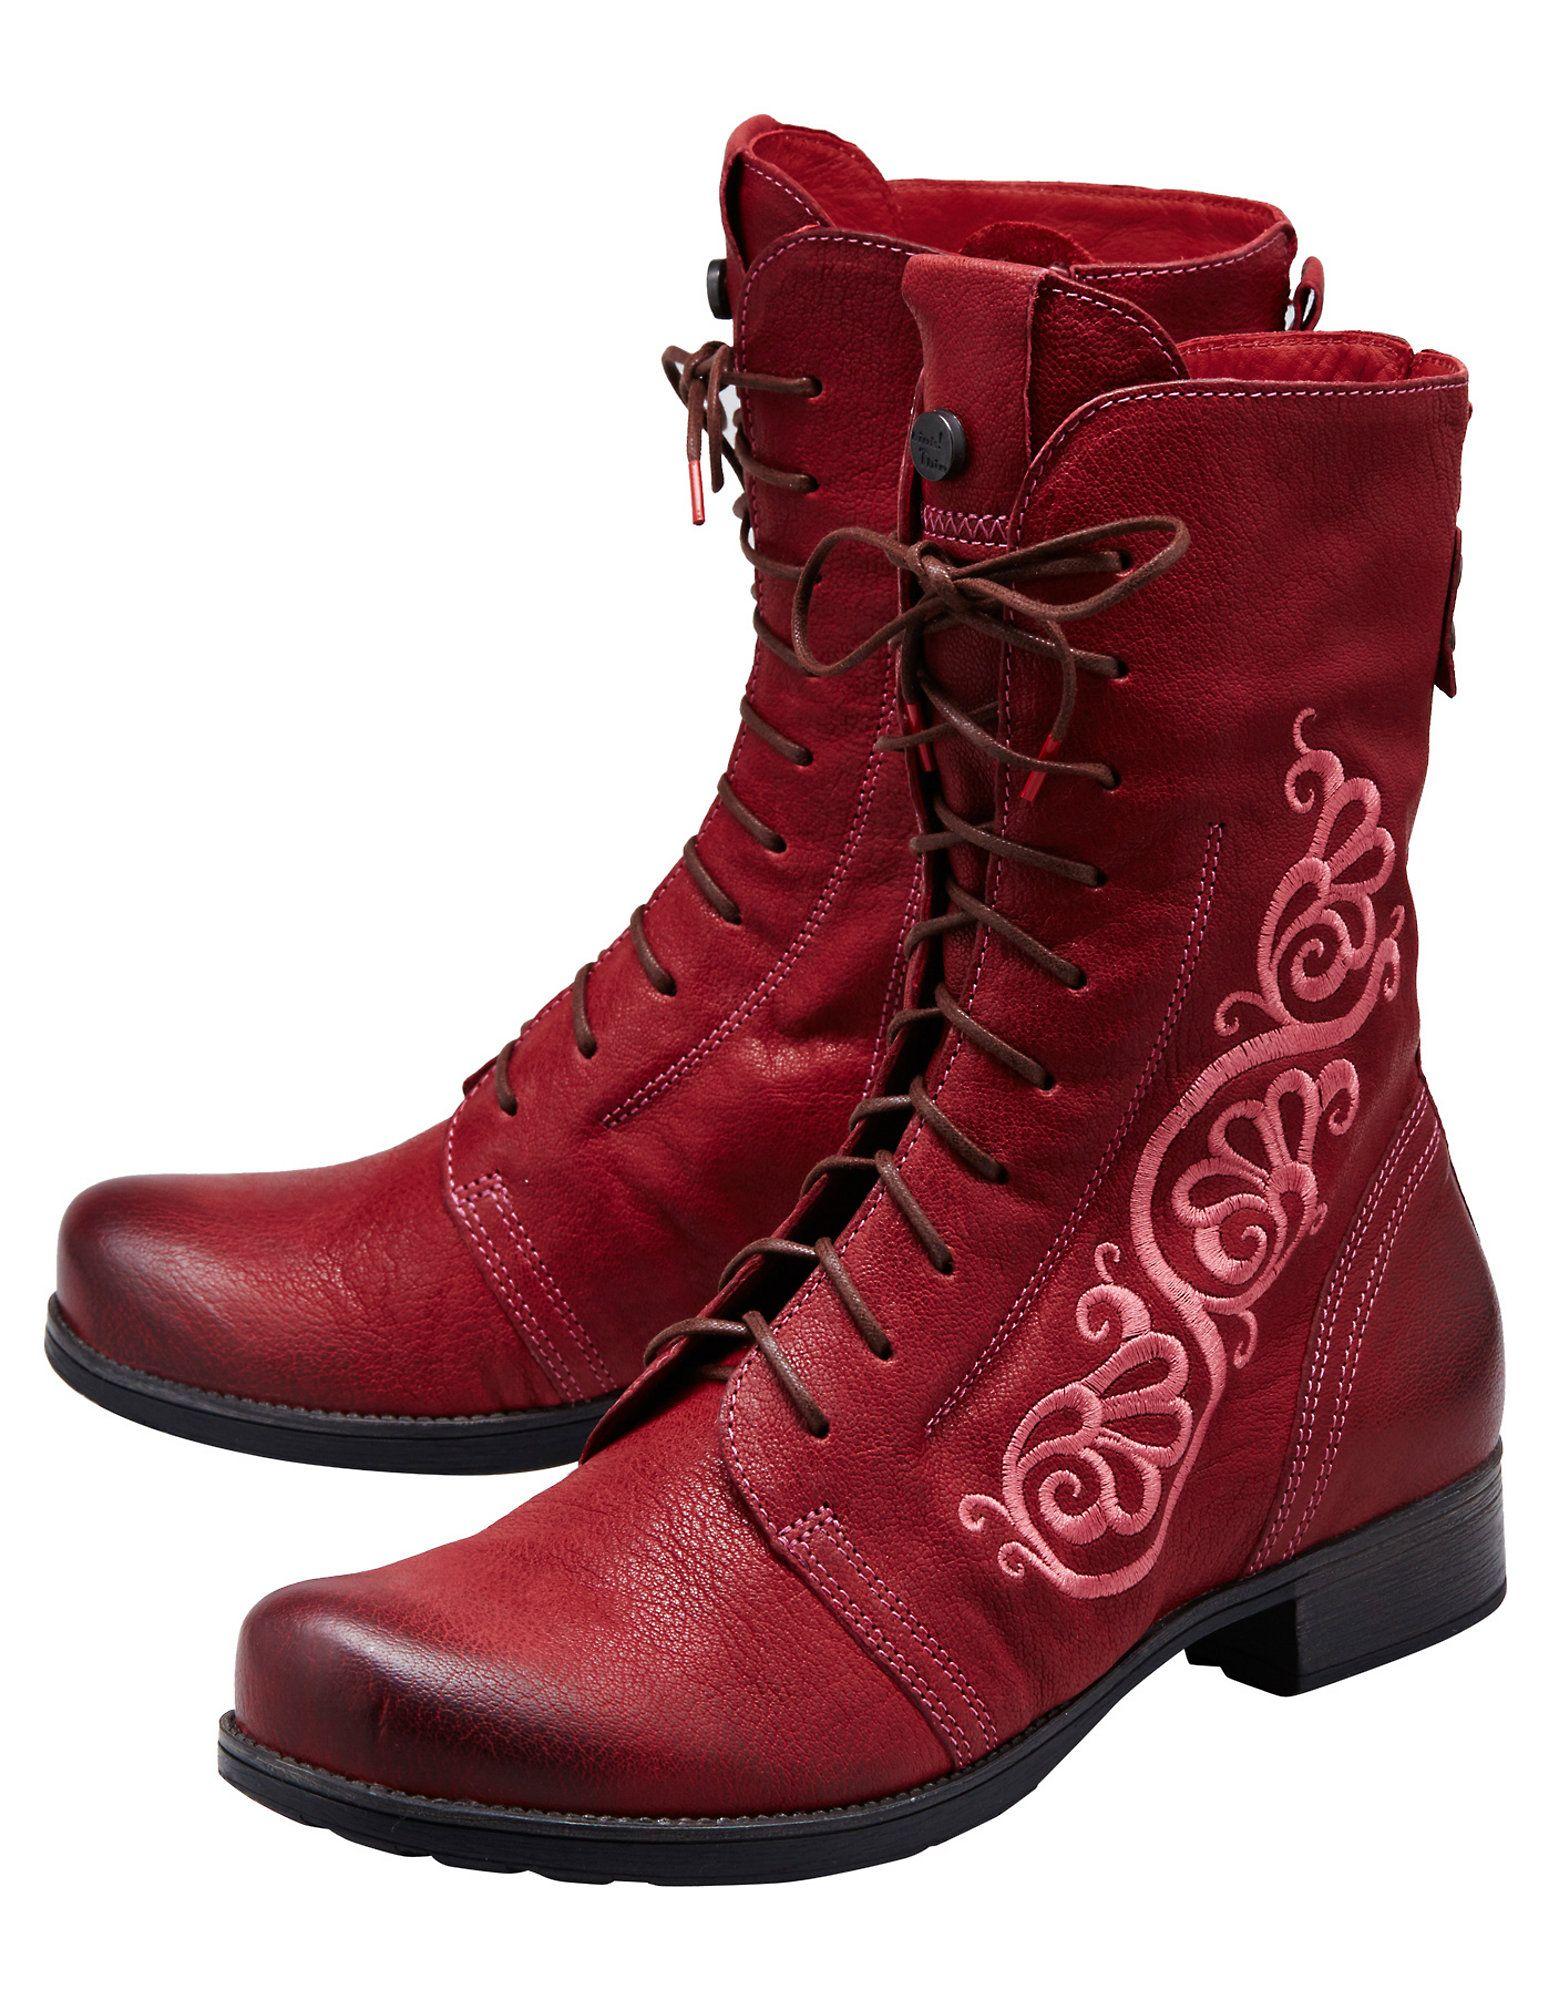 size 40 61897 9bb61 Think Stiefeletten Rentje, bordeaux | Boots | Think schuhe ...